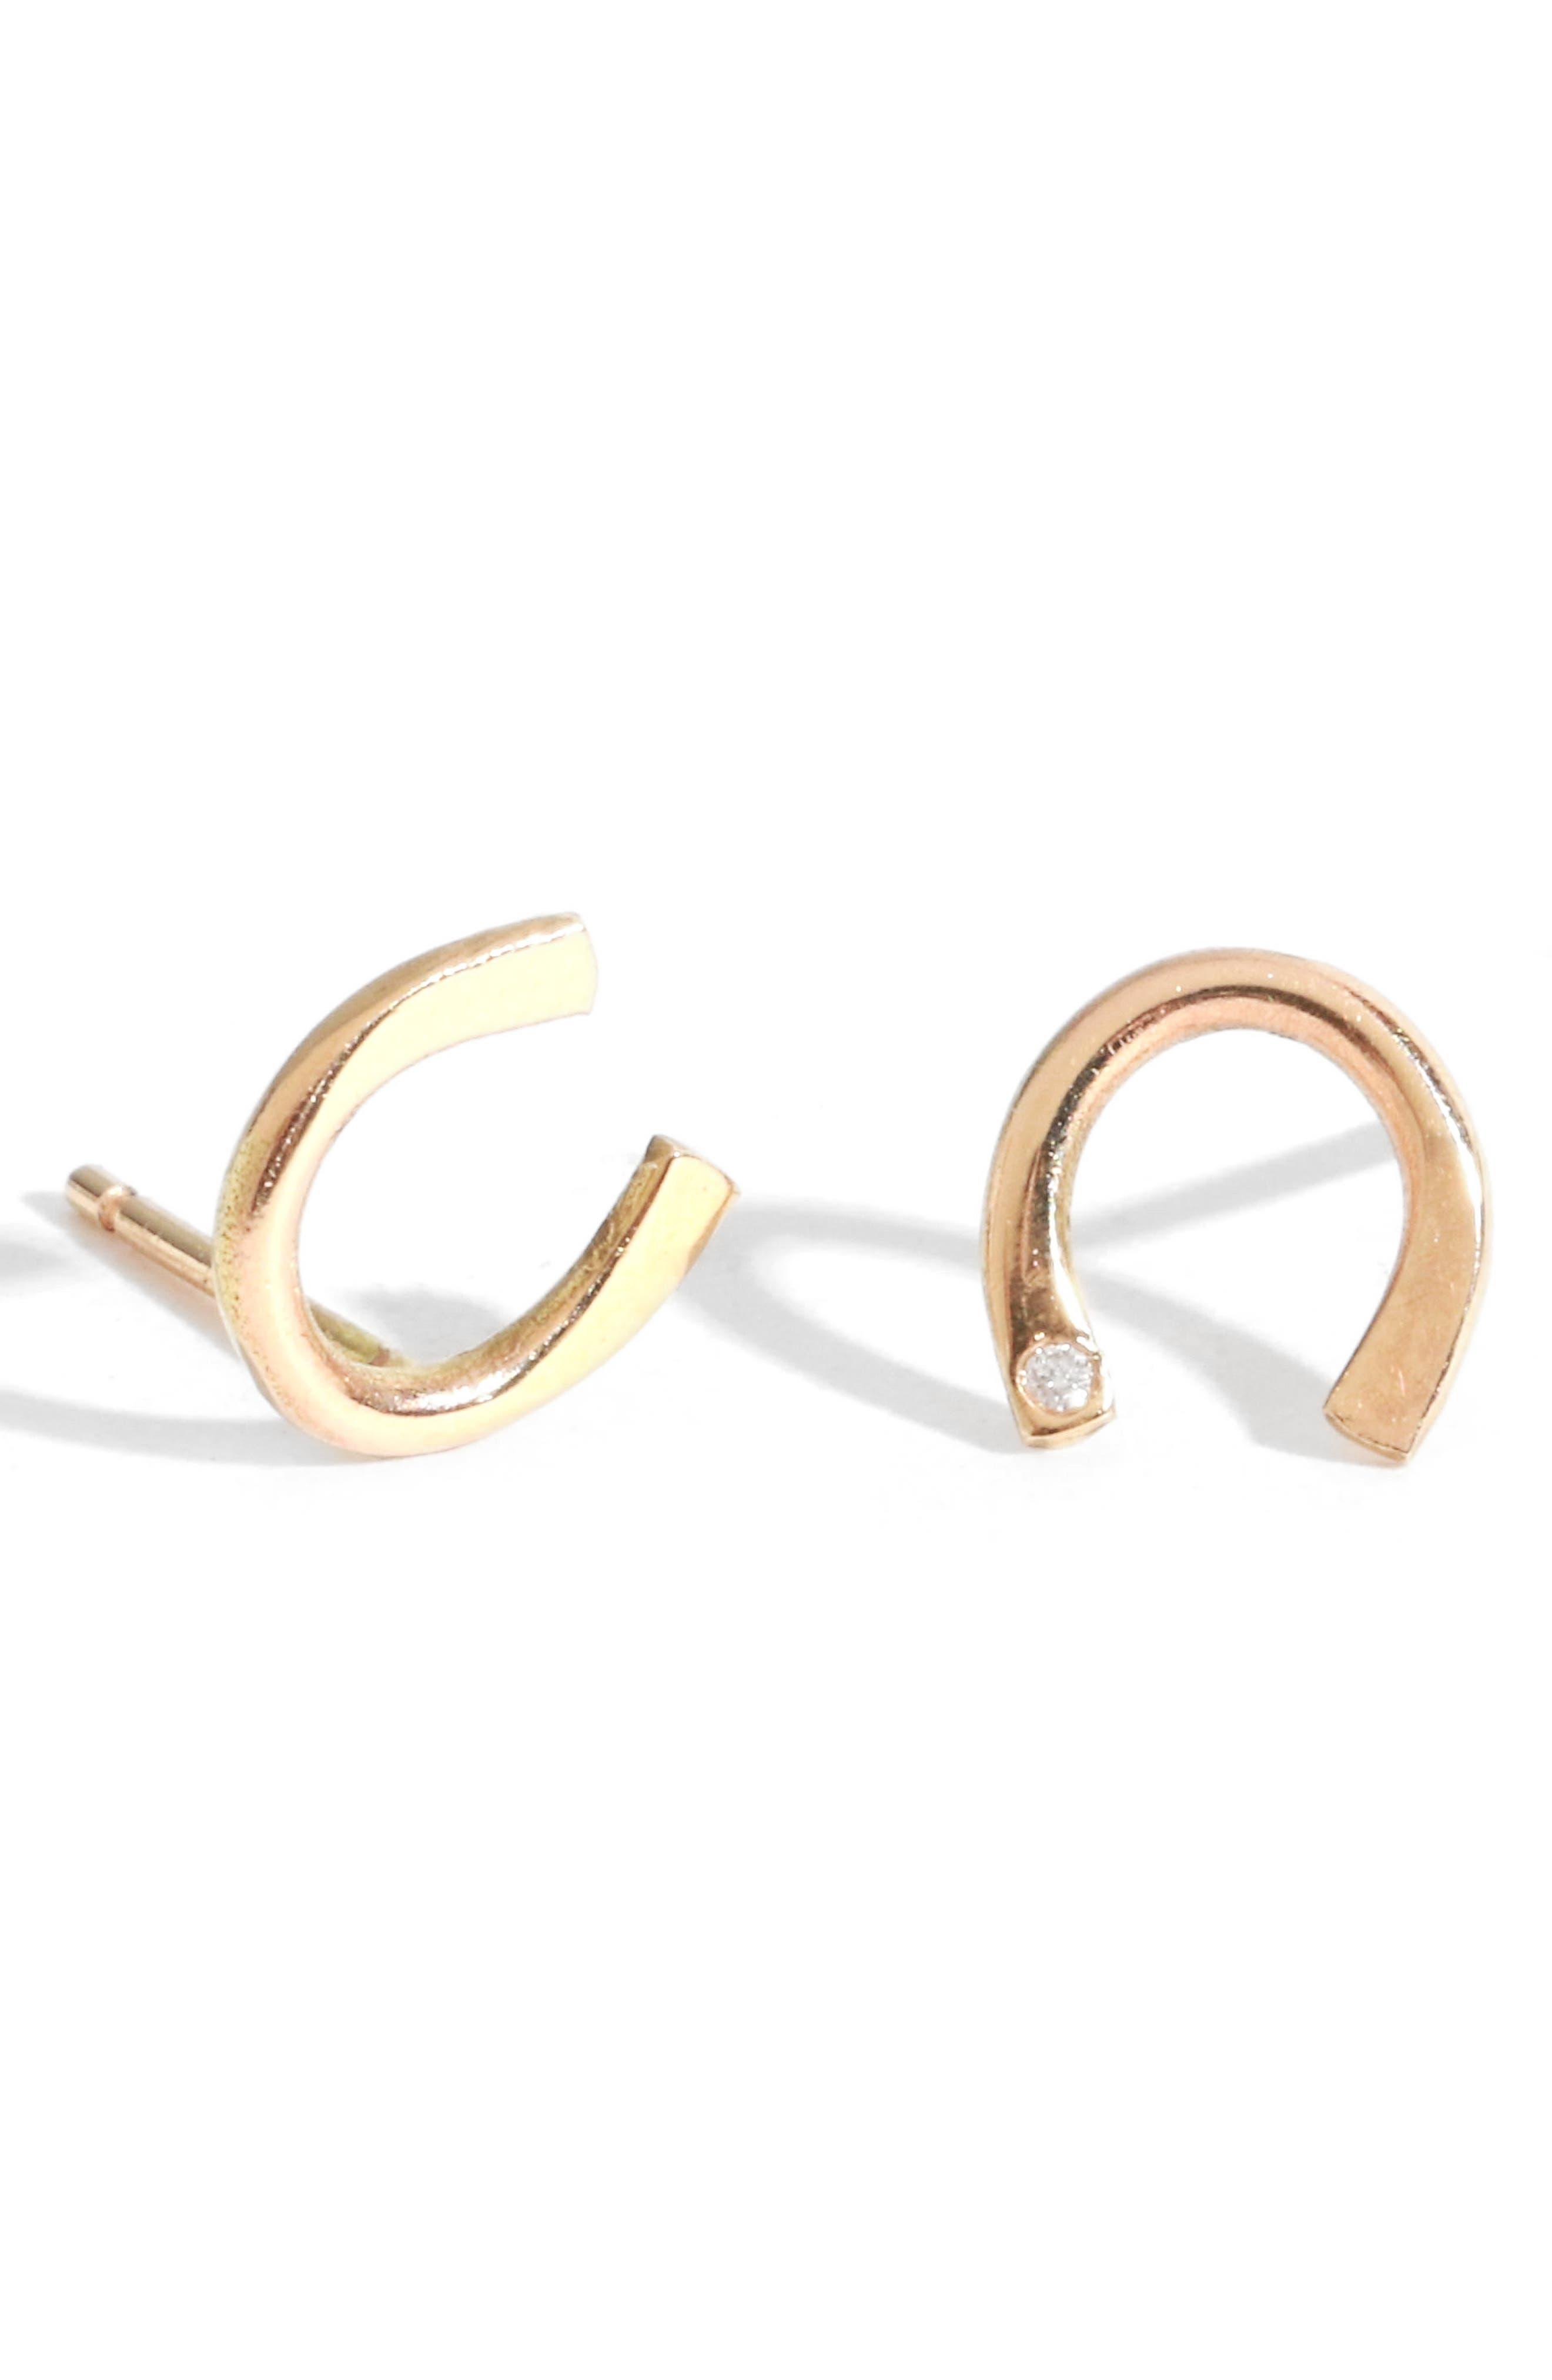 Diamond Horseshoe Stud Earrings,                         Main,                         color, Yellow Gold